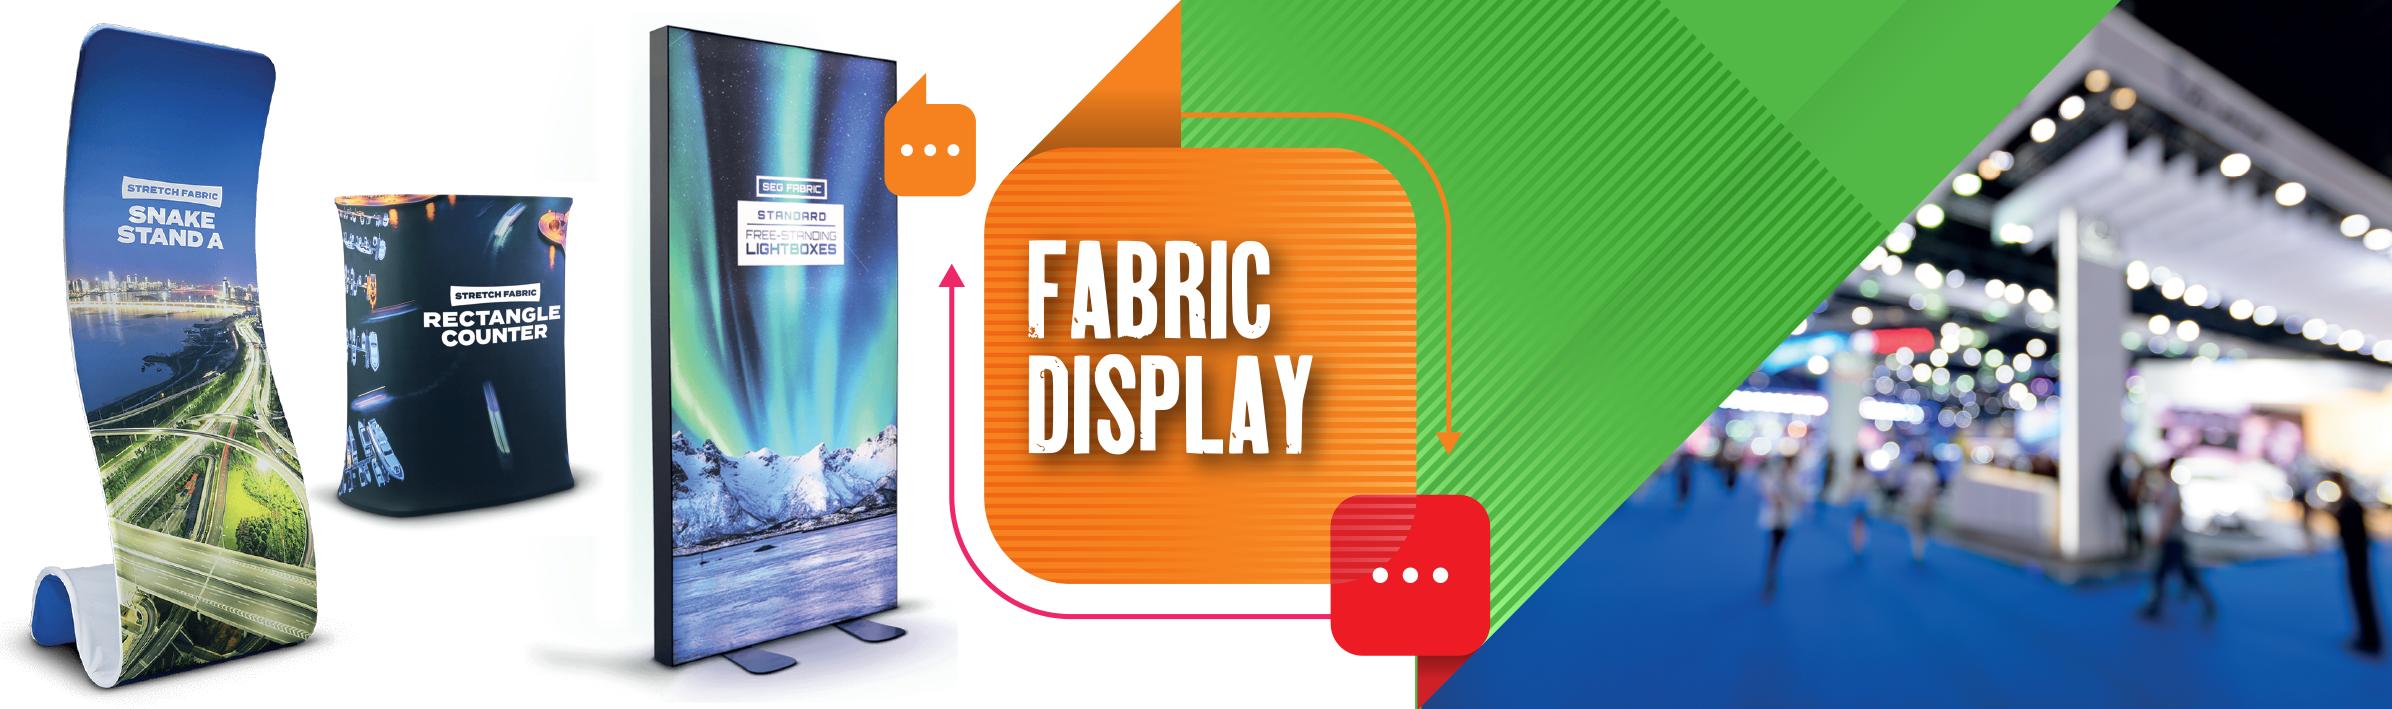 Fabric Display Product Slider 2021